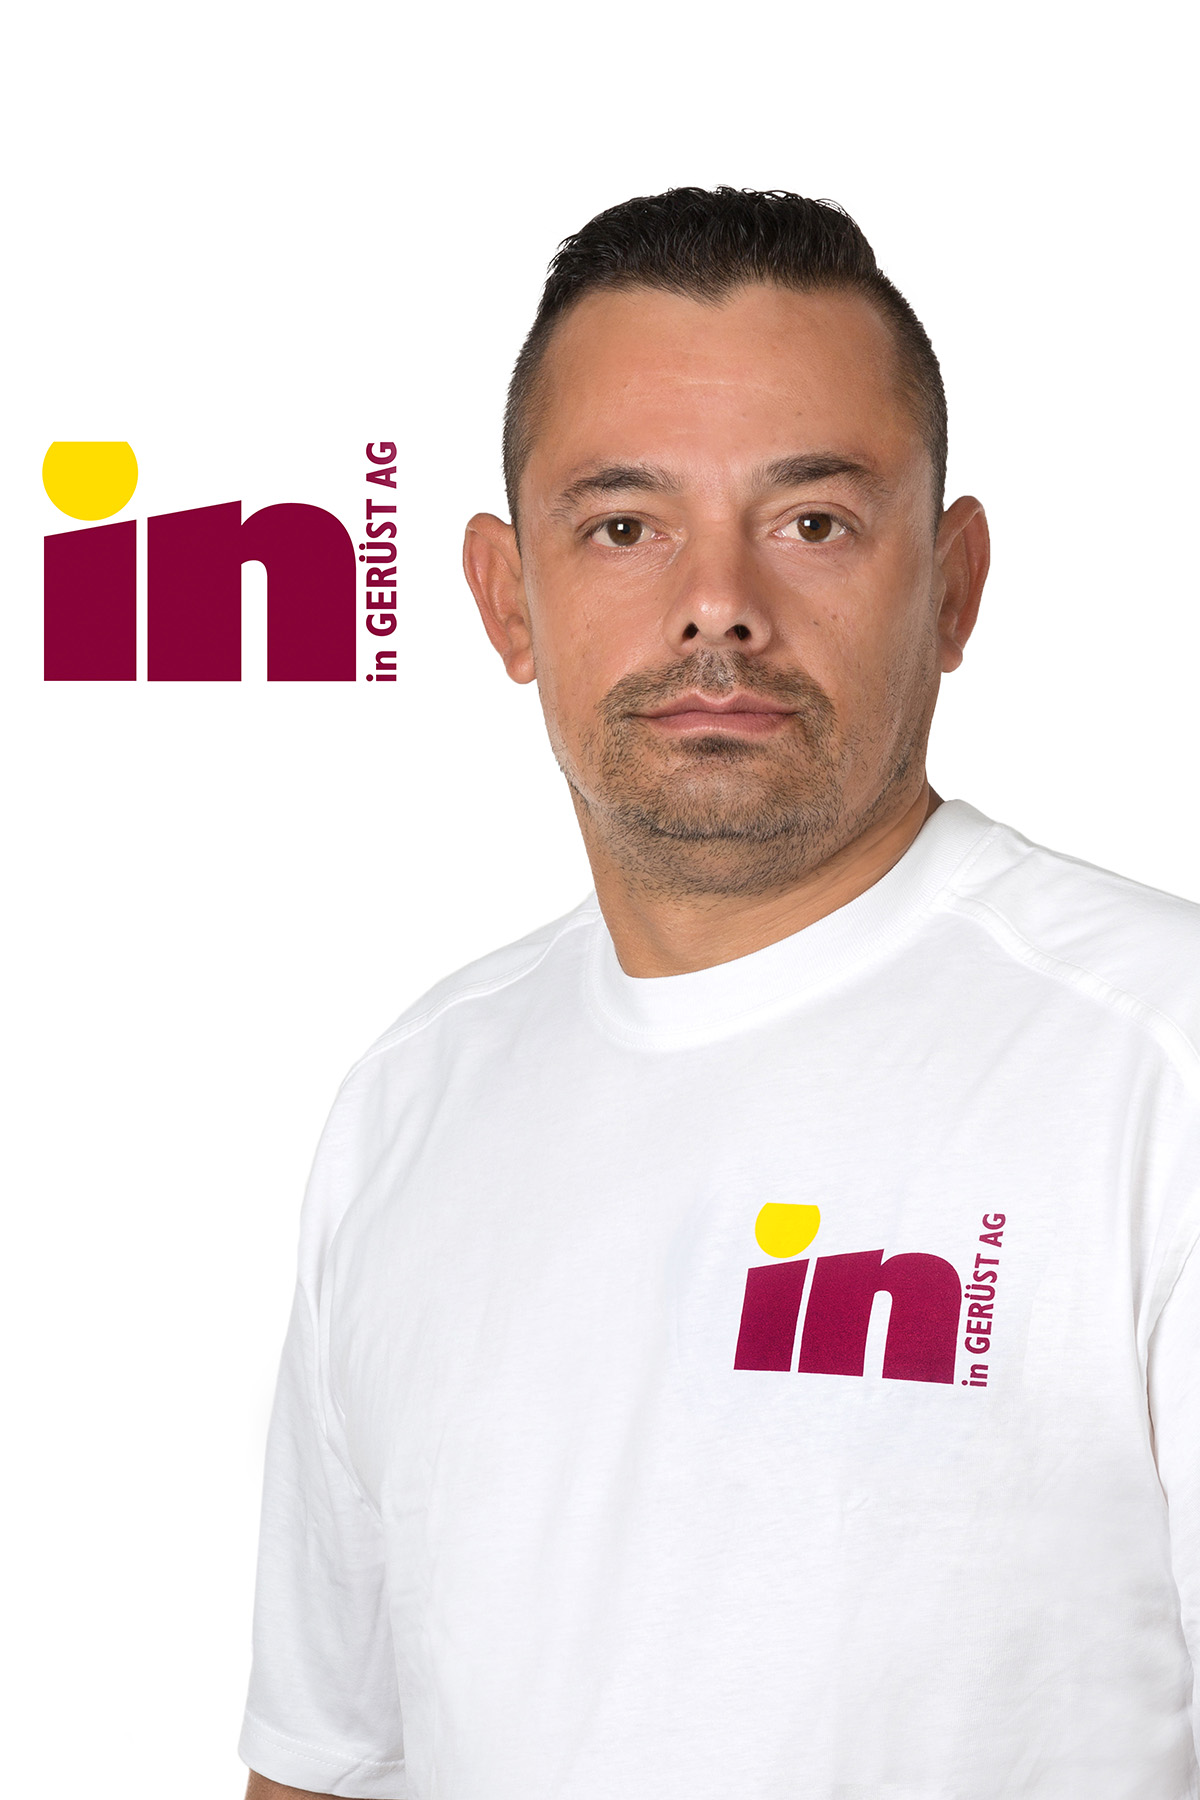 Antonio Miguel Pinto Moreira